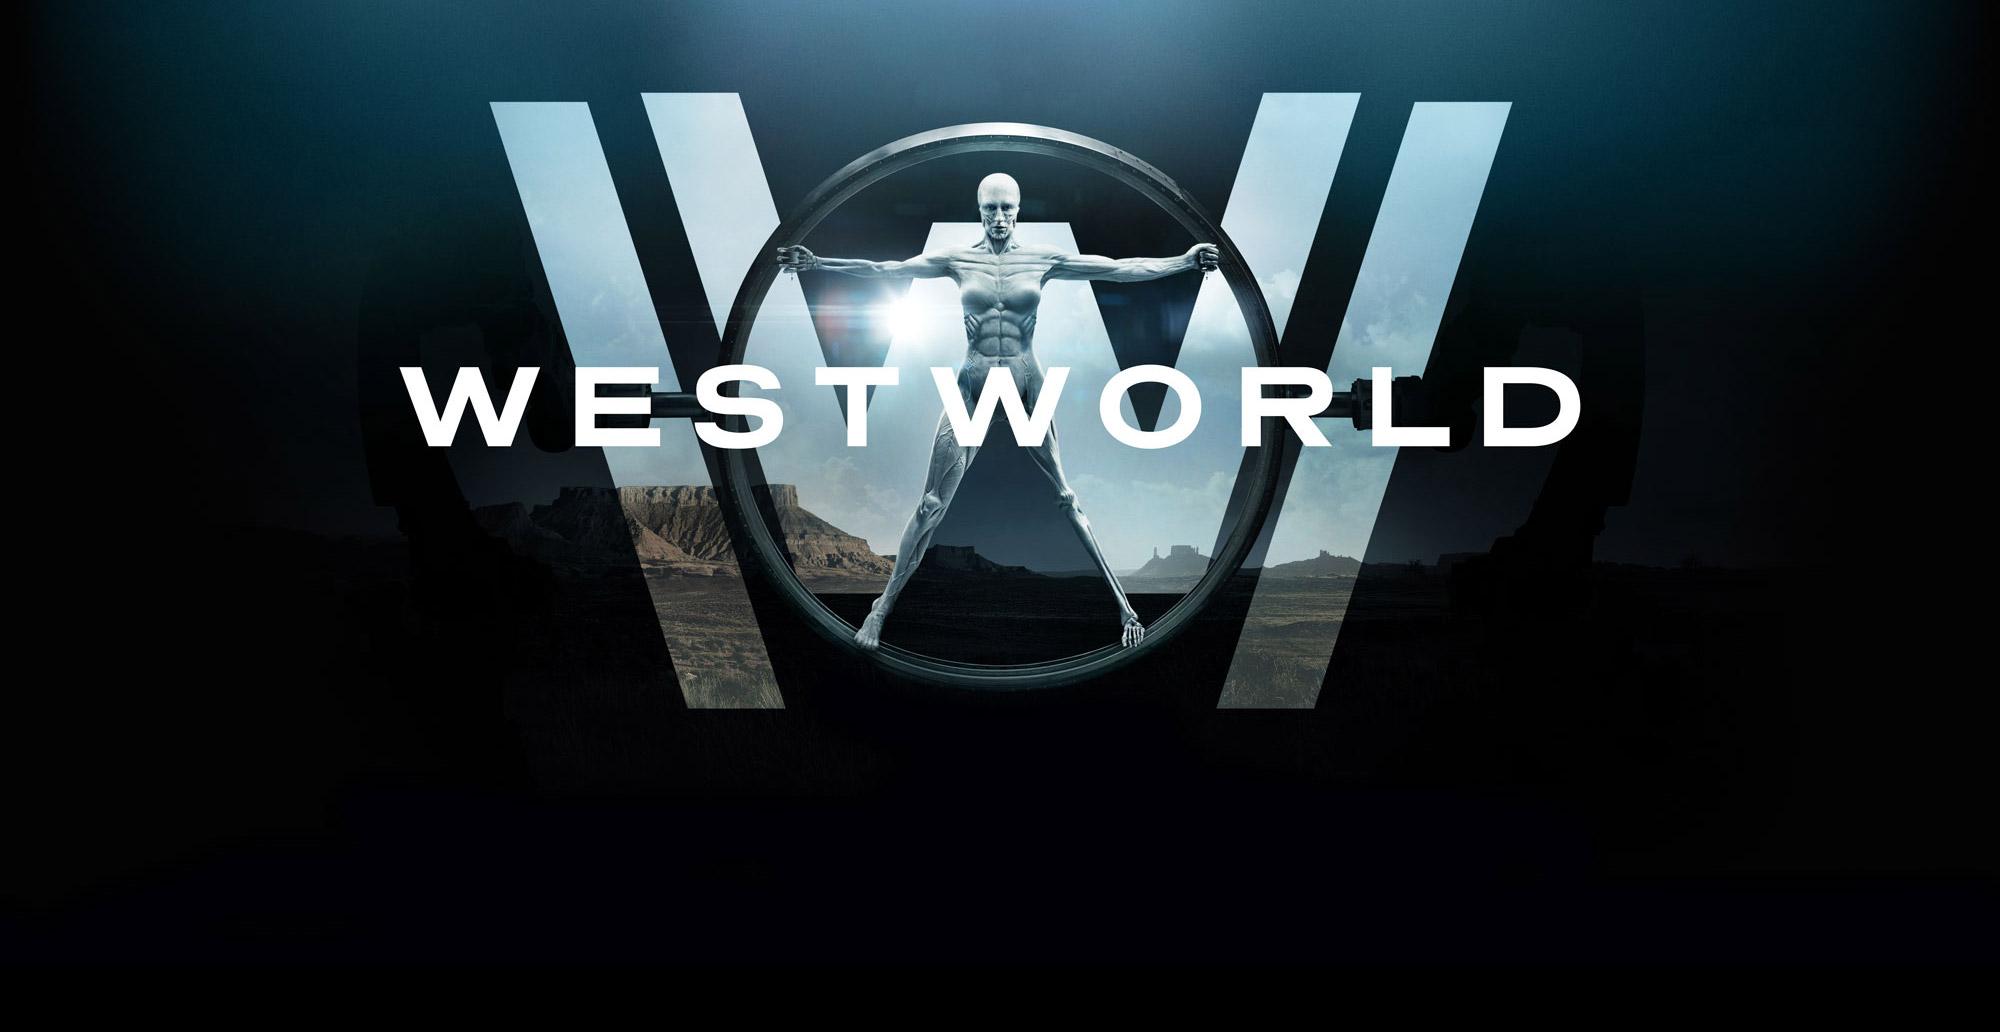 westworld-overlay-a.jpg (2000×1032)